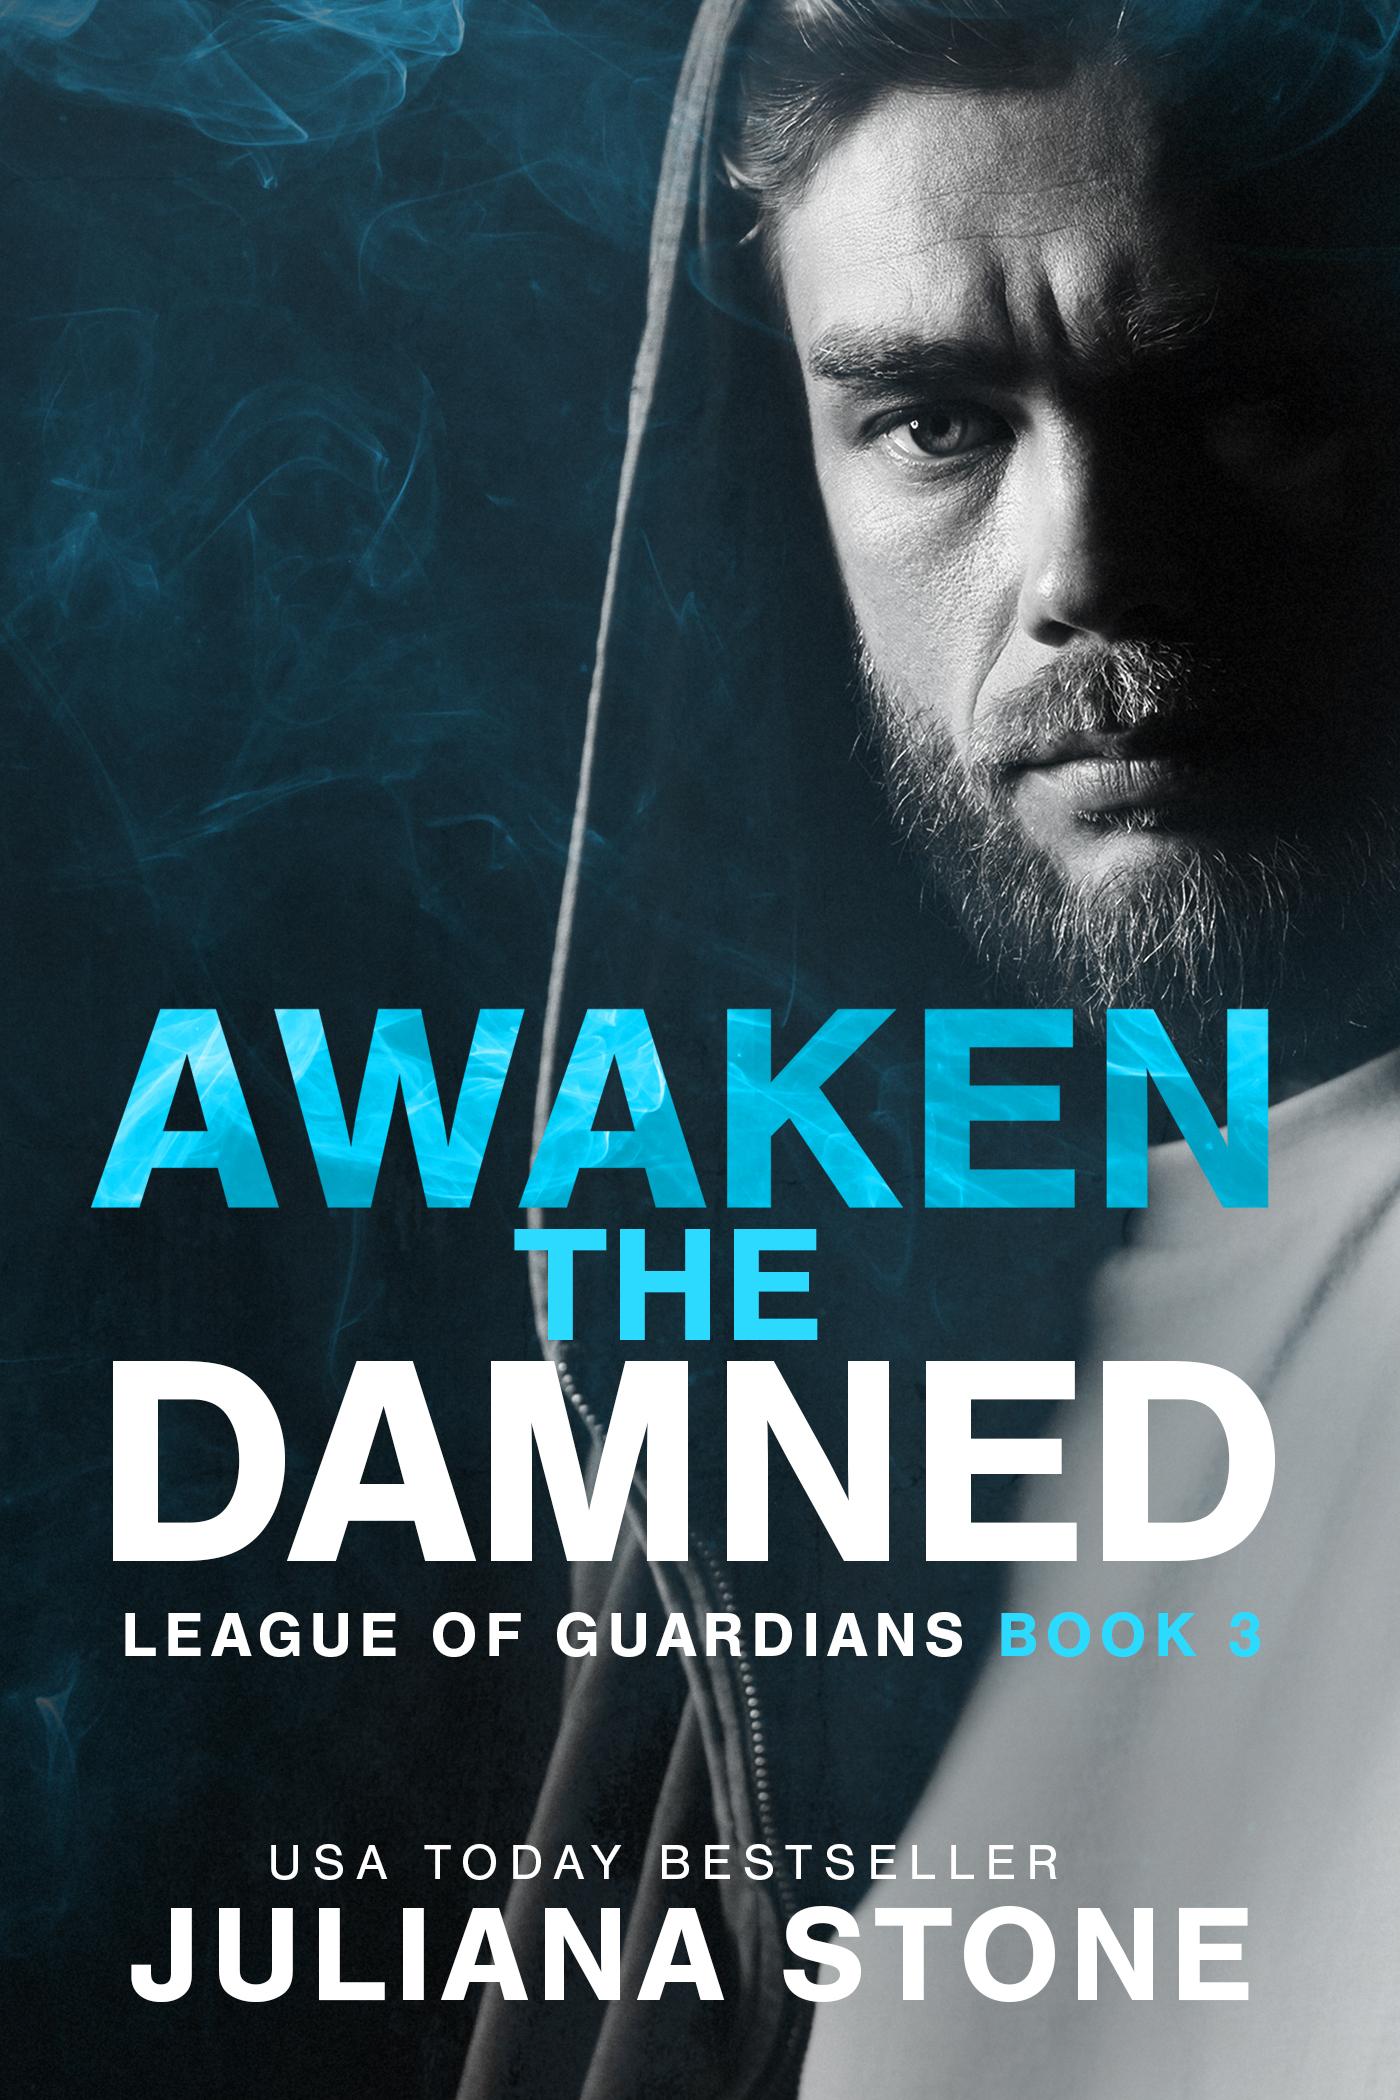 Awaken The Damned by Juliana Stone